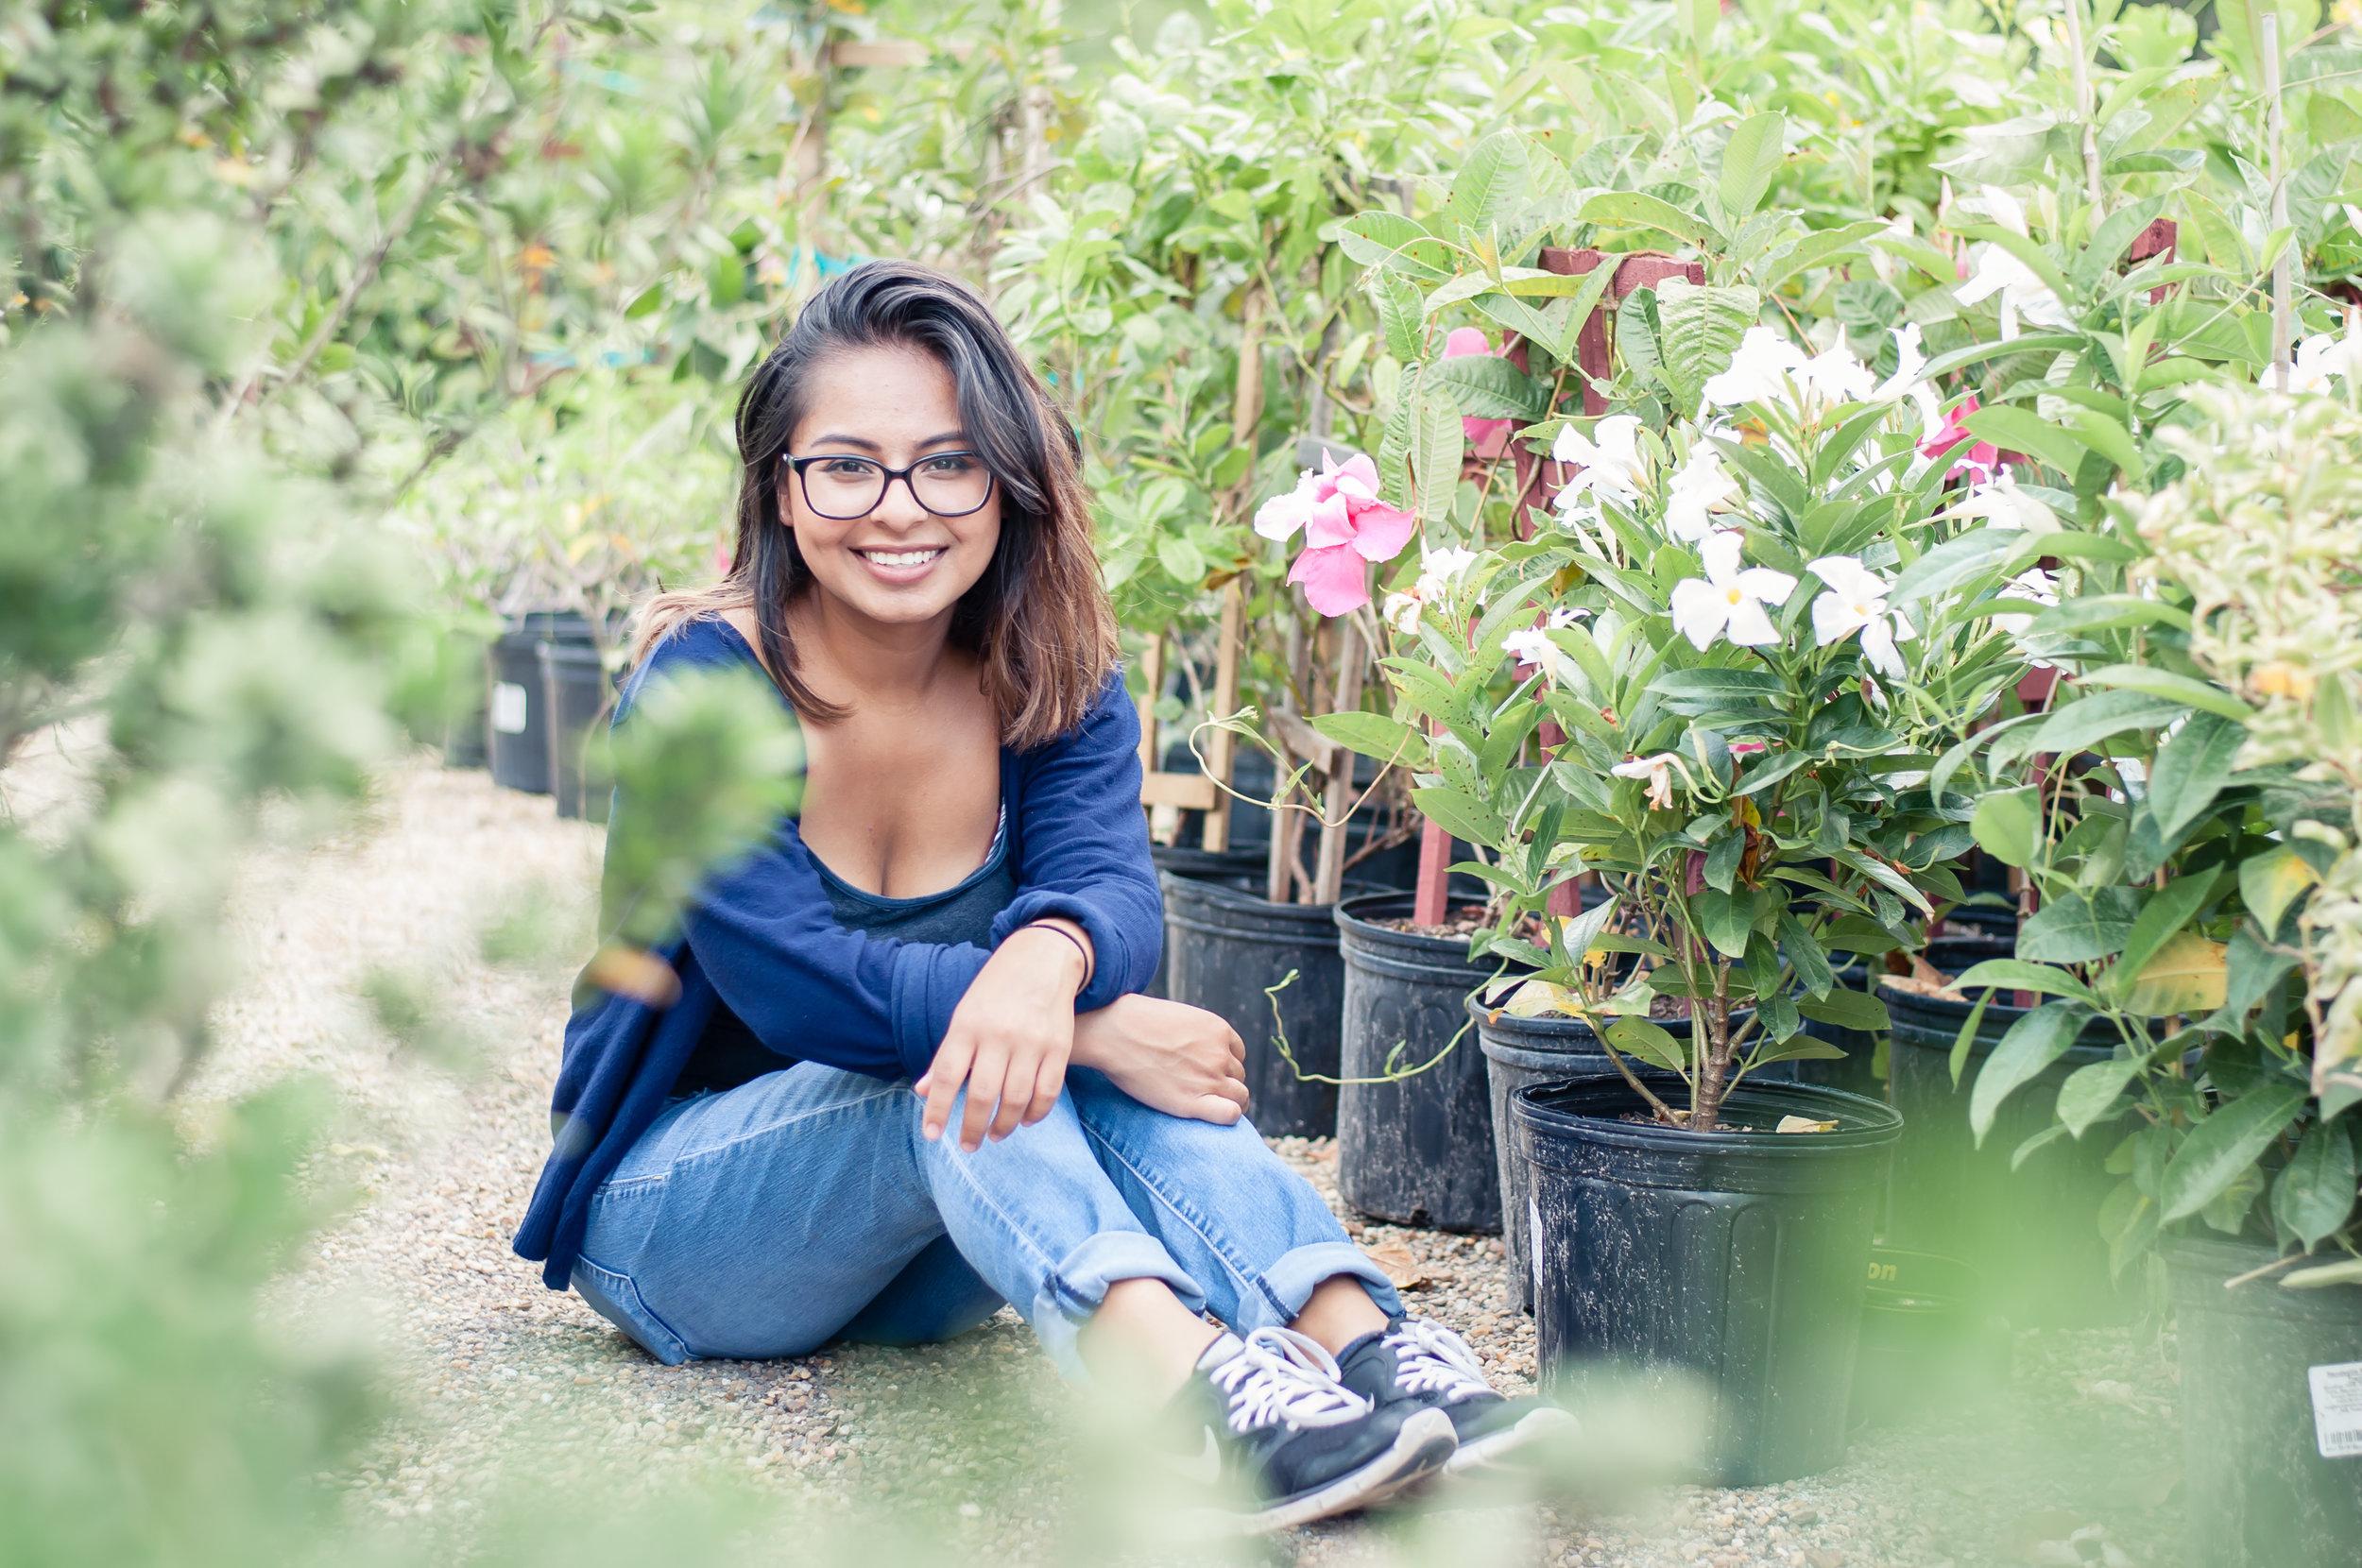 nursery garden photo session